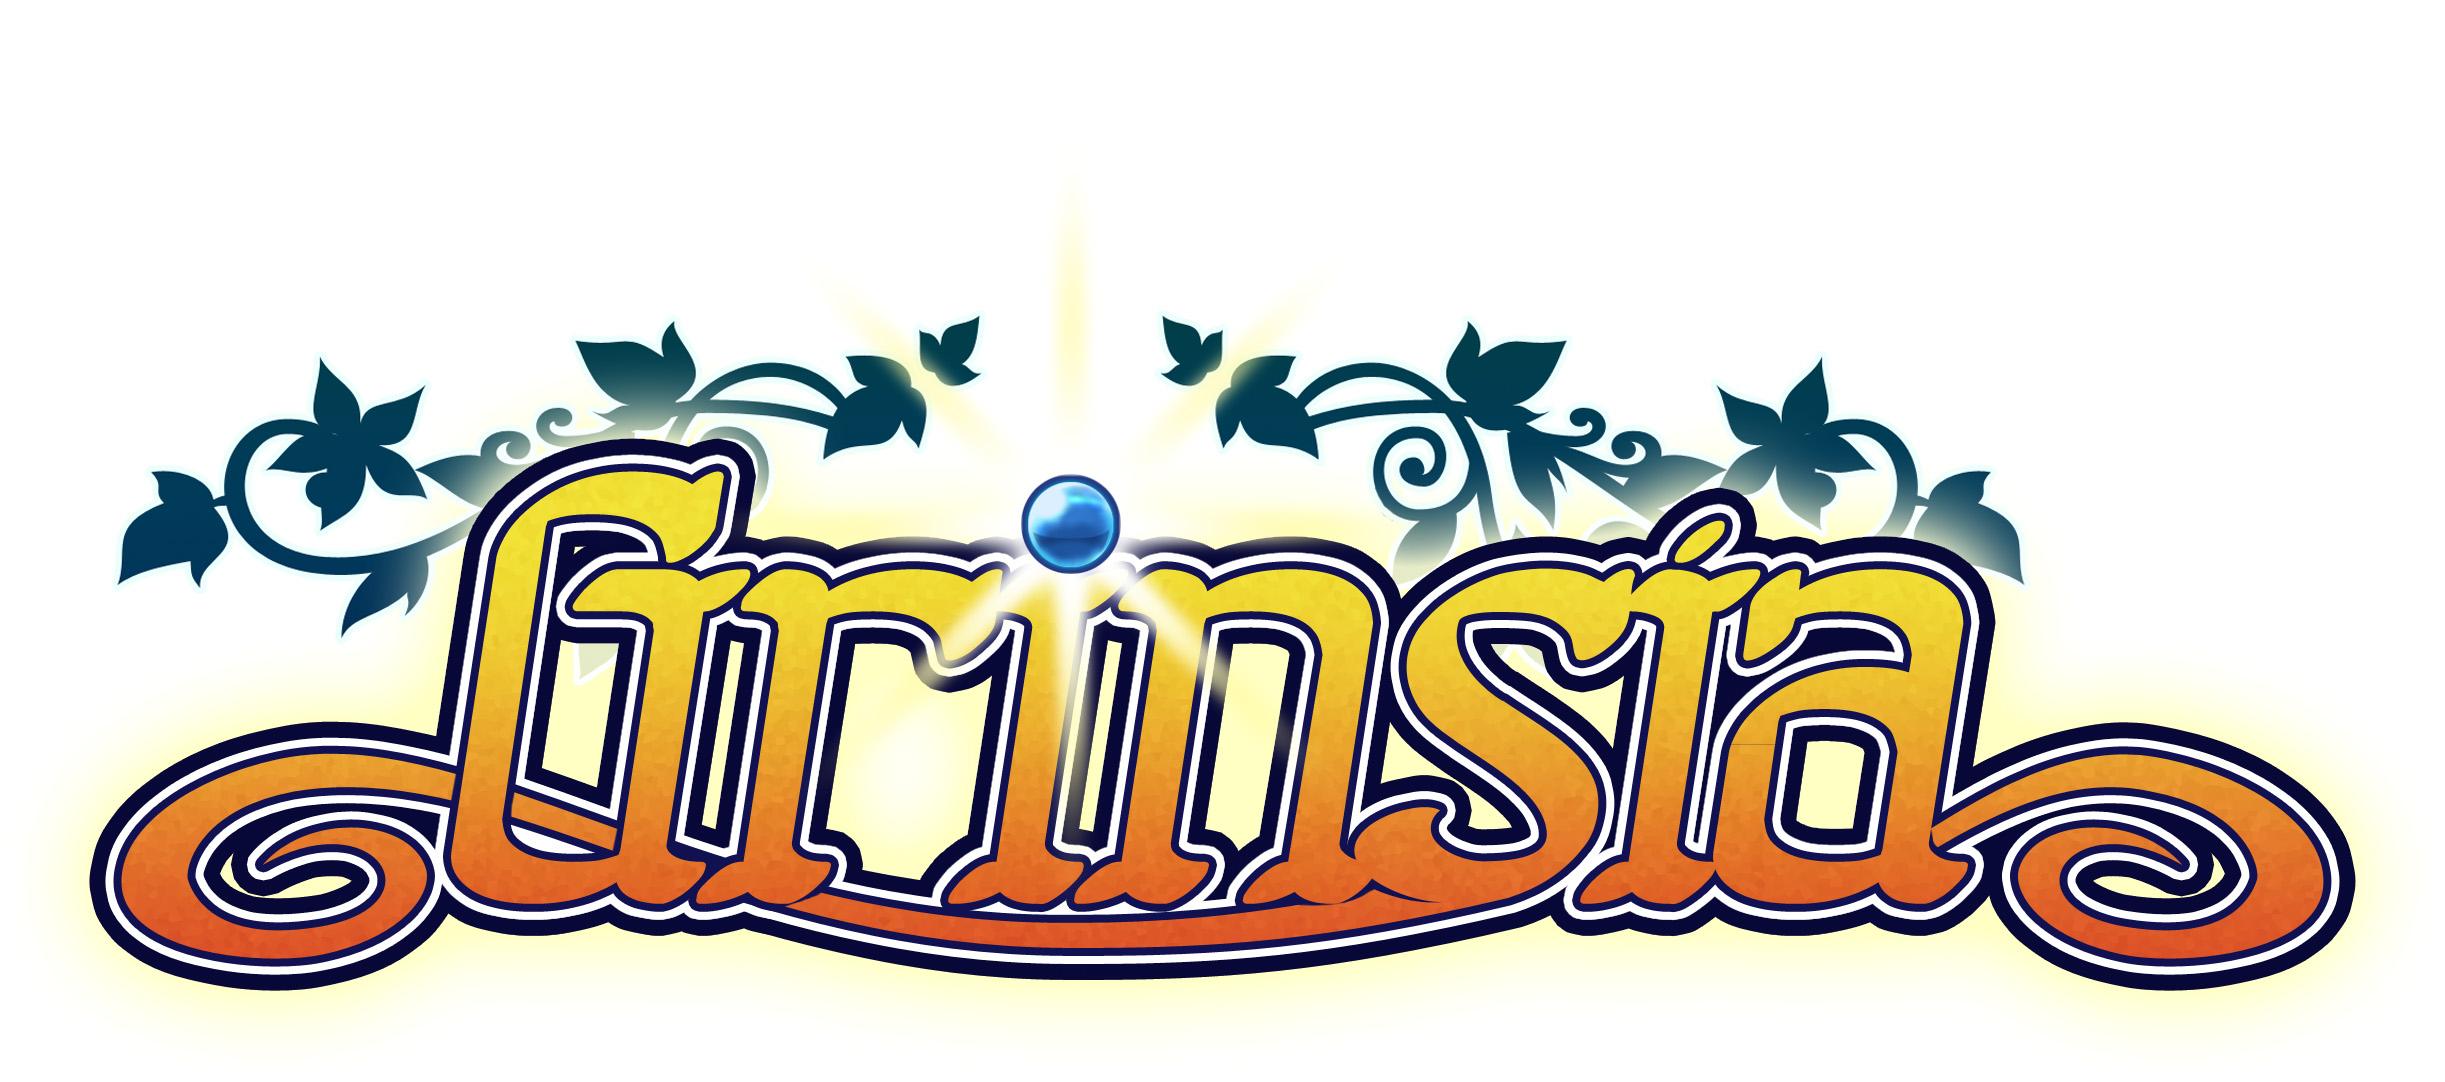 Grinsia-01